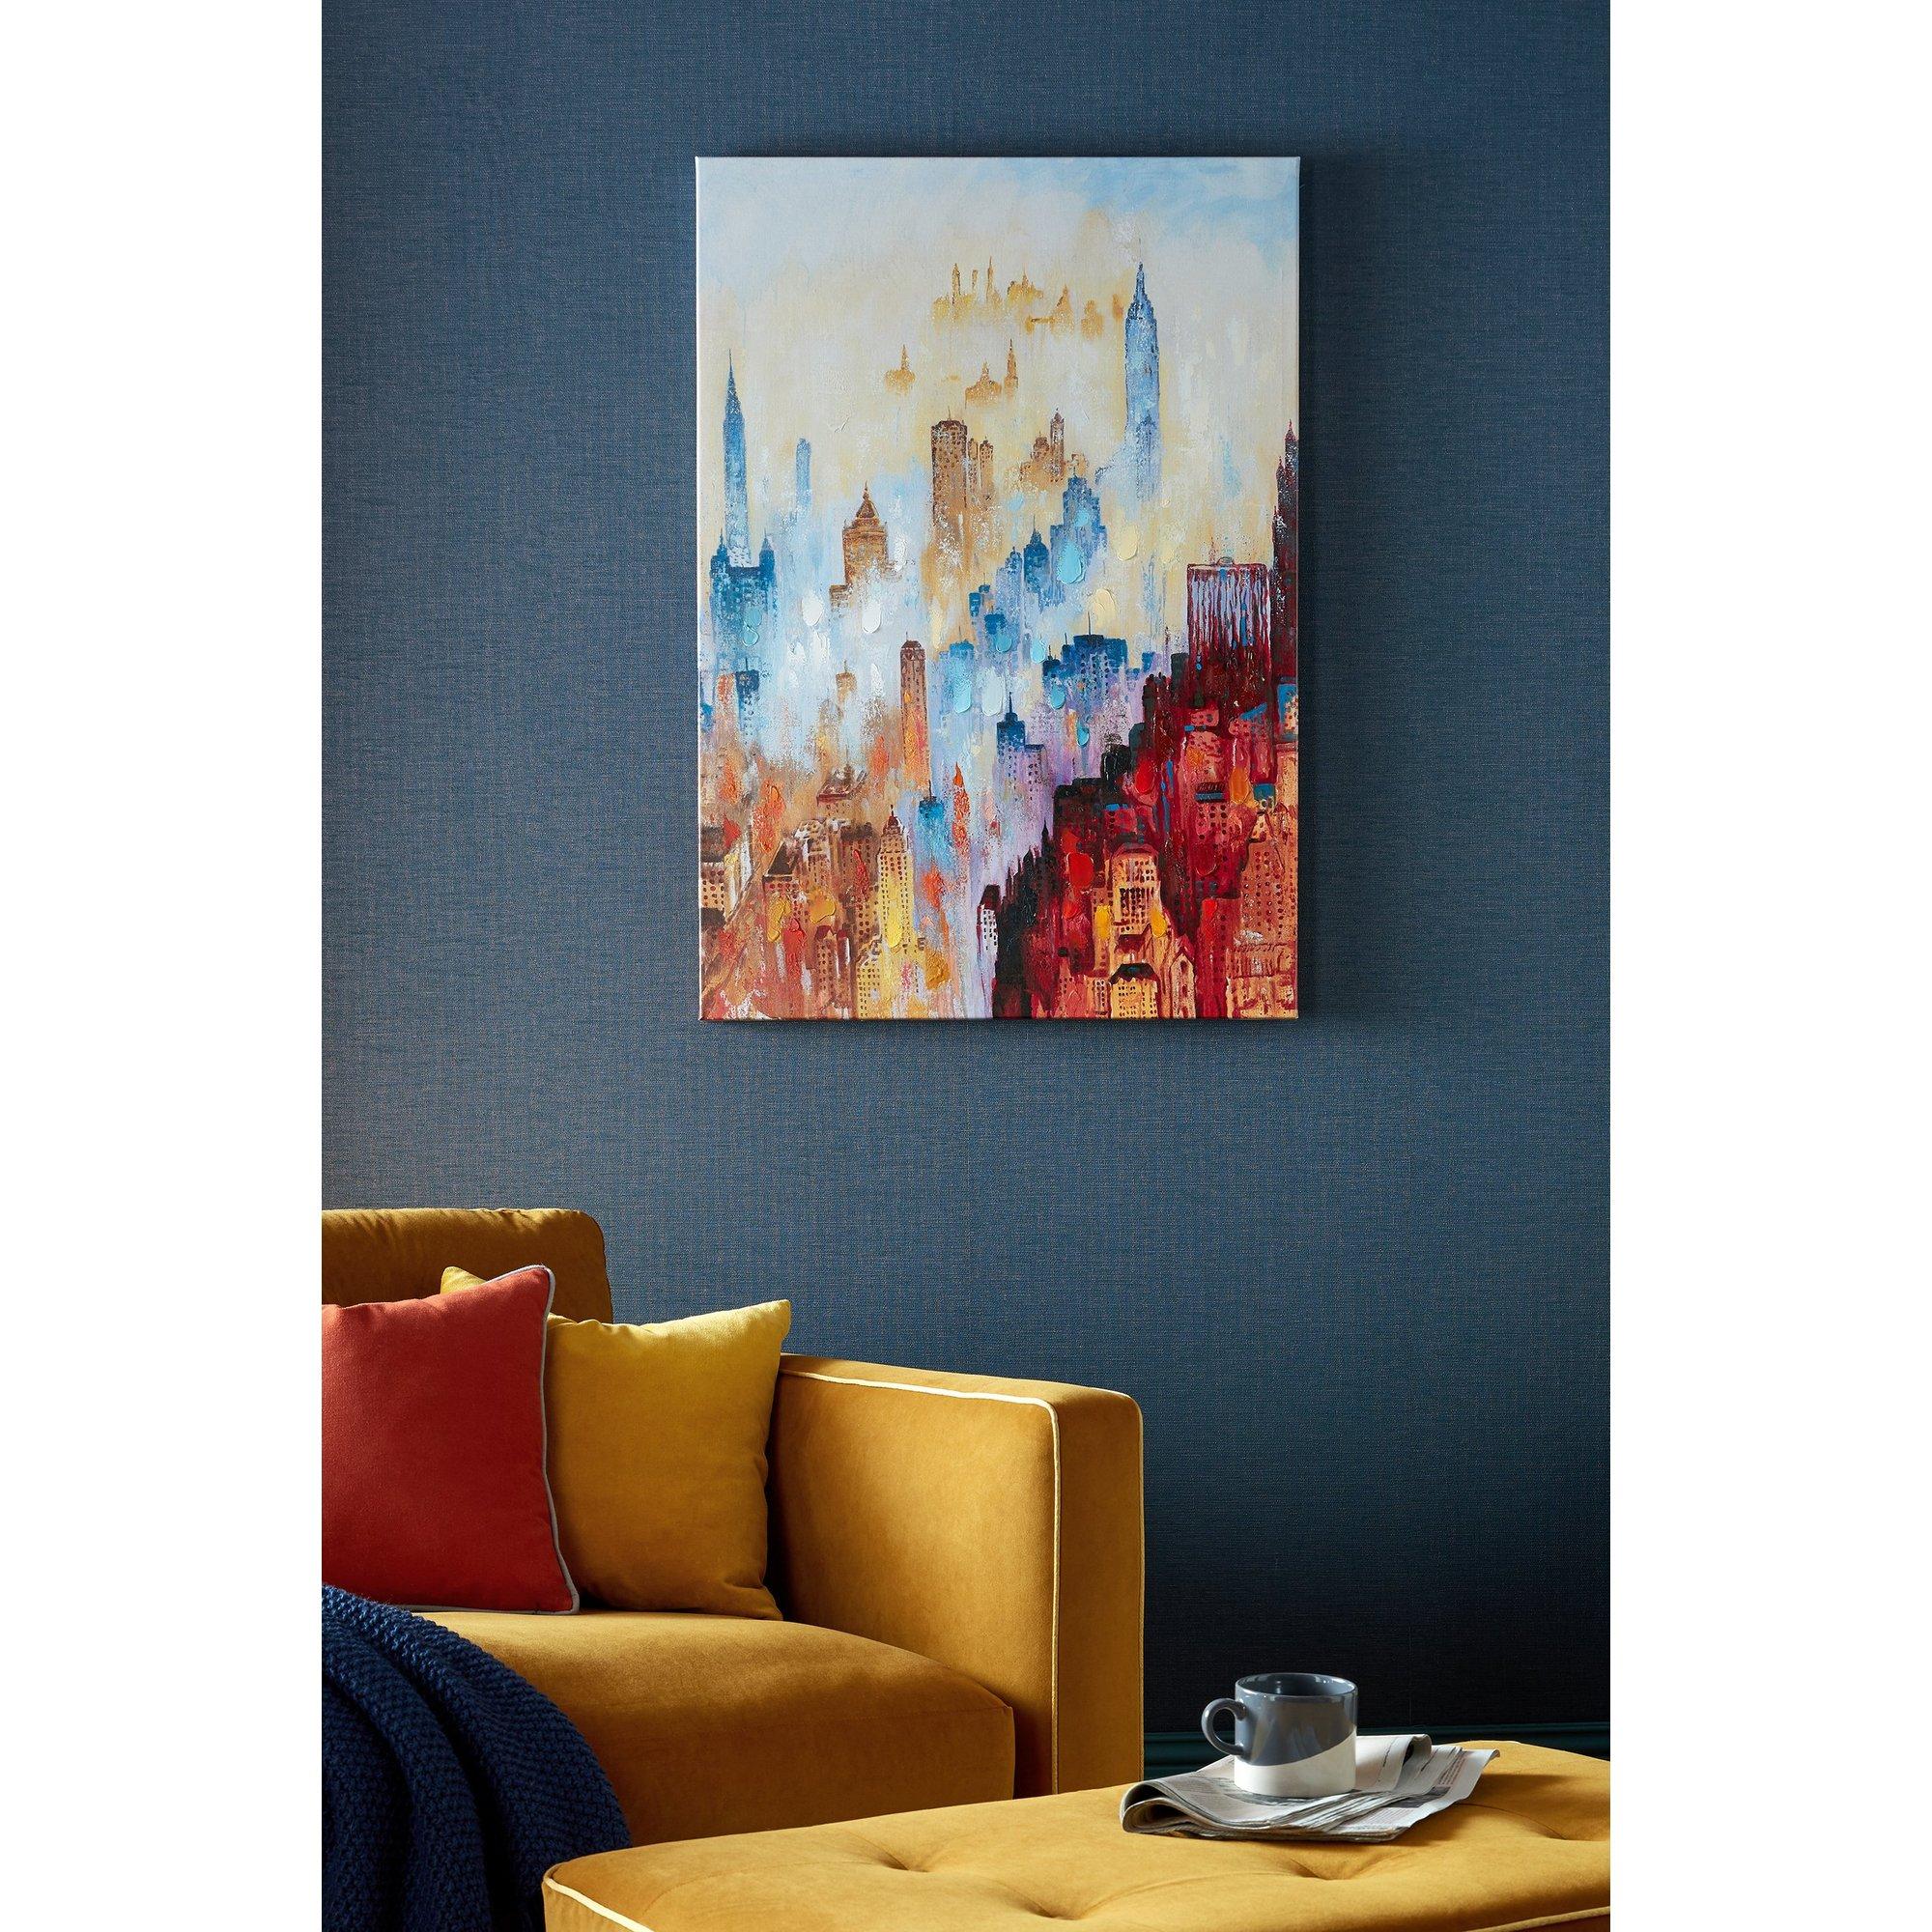 Image of City of Dreams Printed Canvas